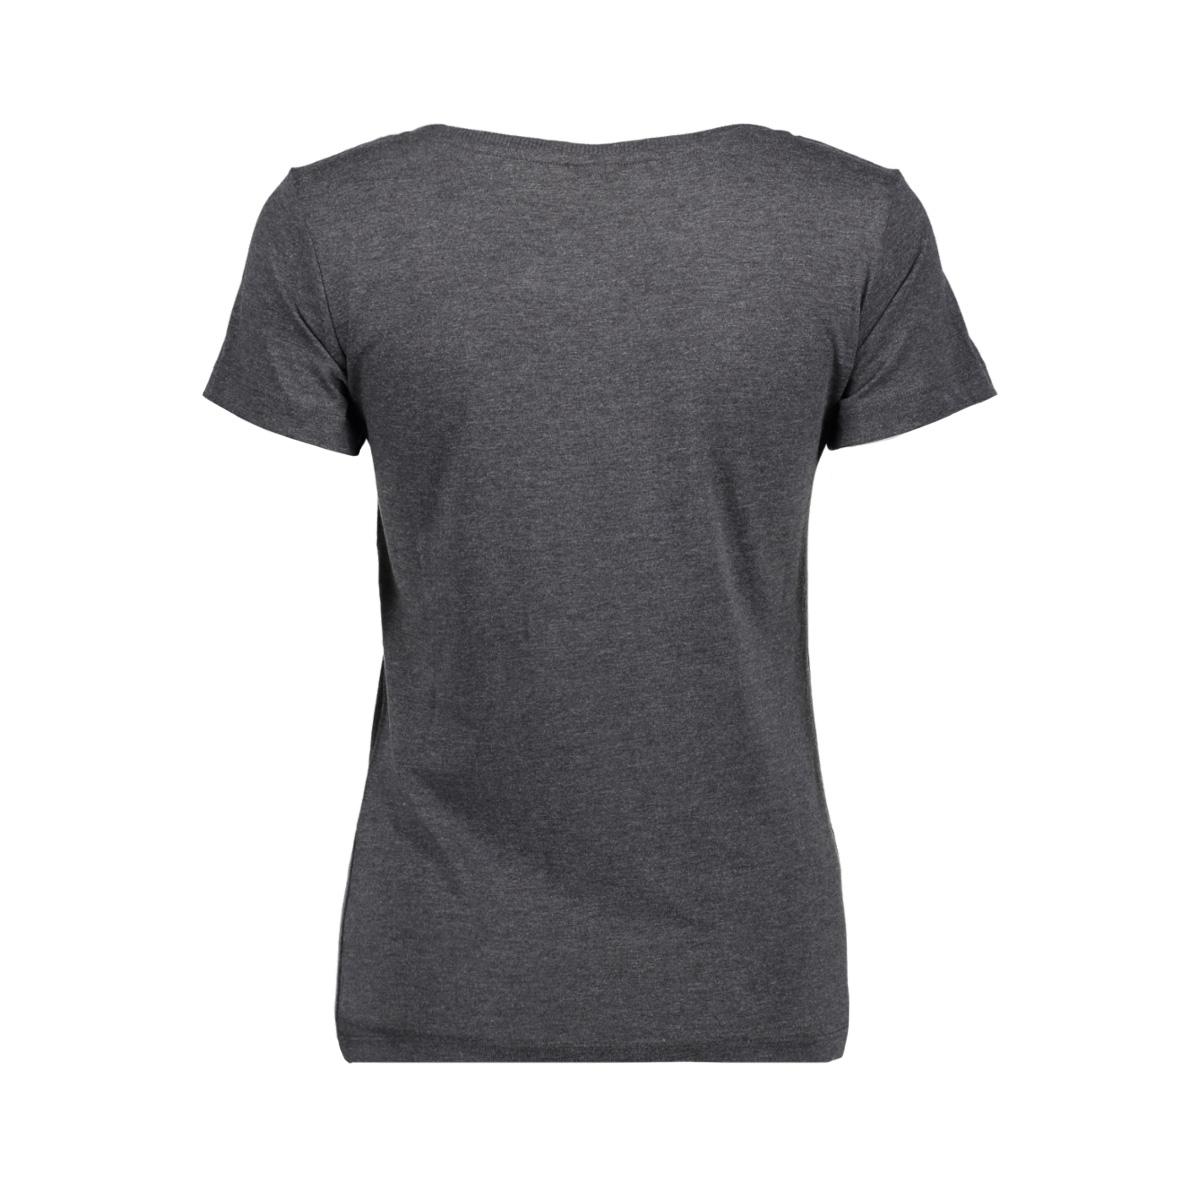 jdychicago s/s print top 10  jrs 15146739 jacqueline de yong t-shirt dark grey melange/love me